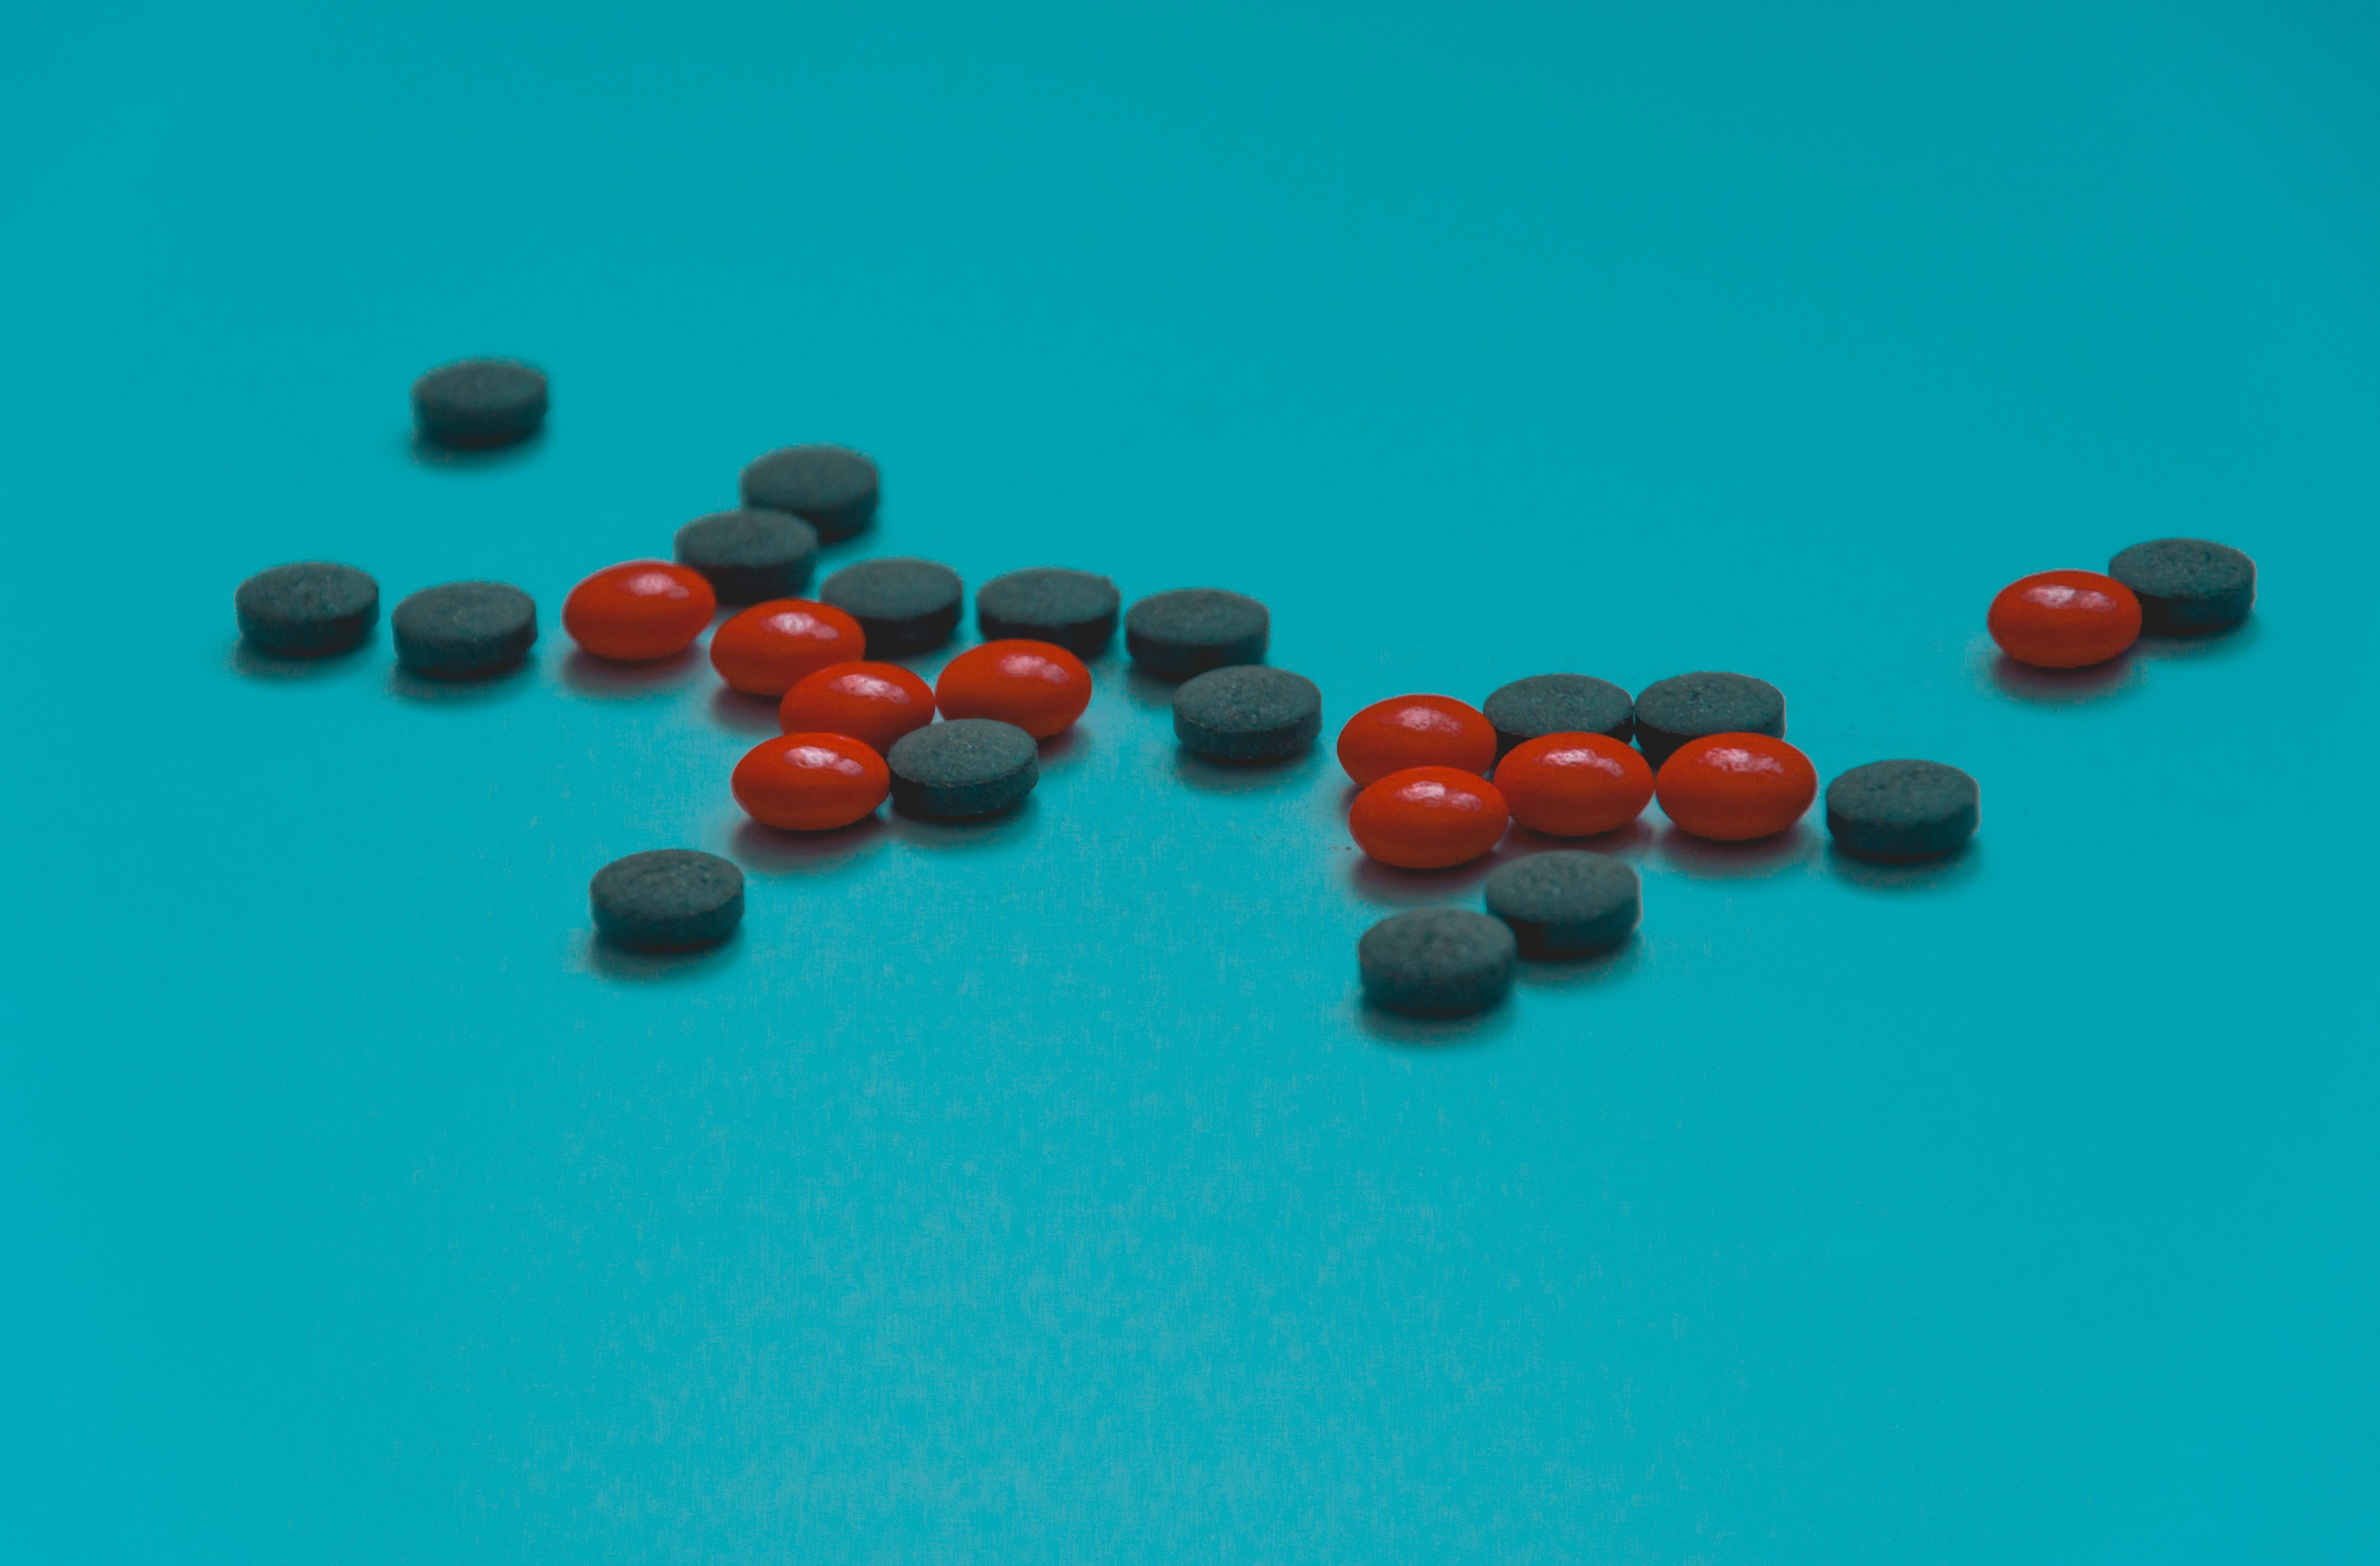 Mallinckrodt Faces Opioid Litigation Yet Again in New York